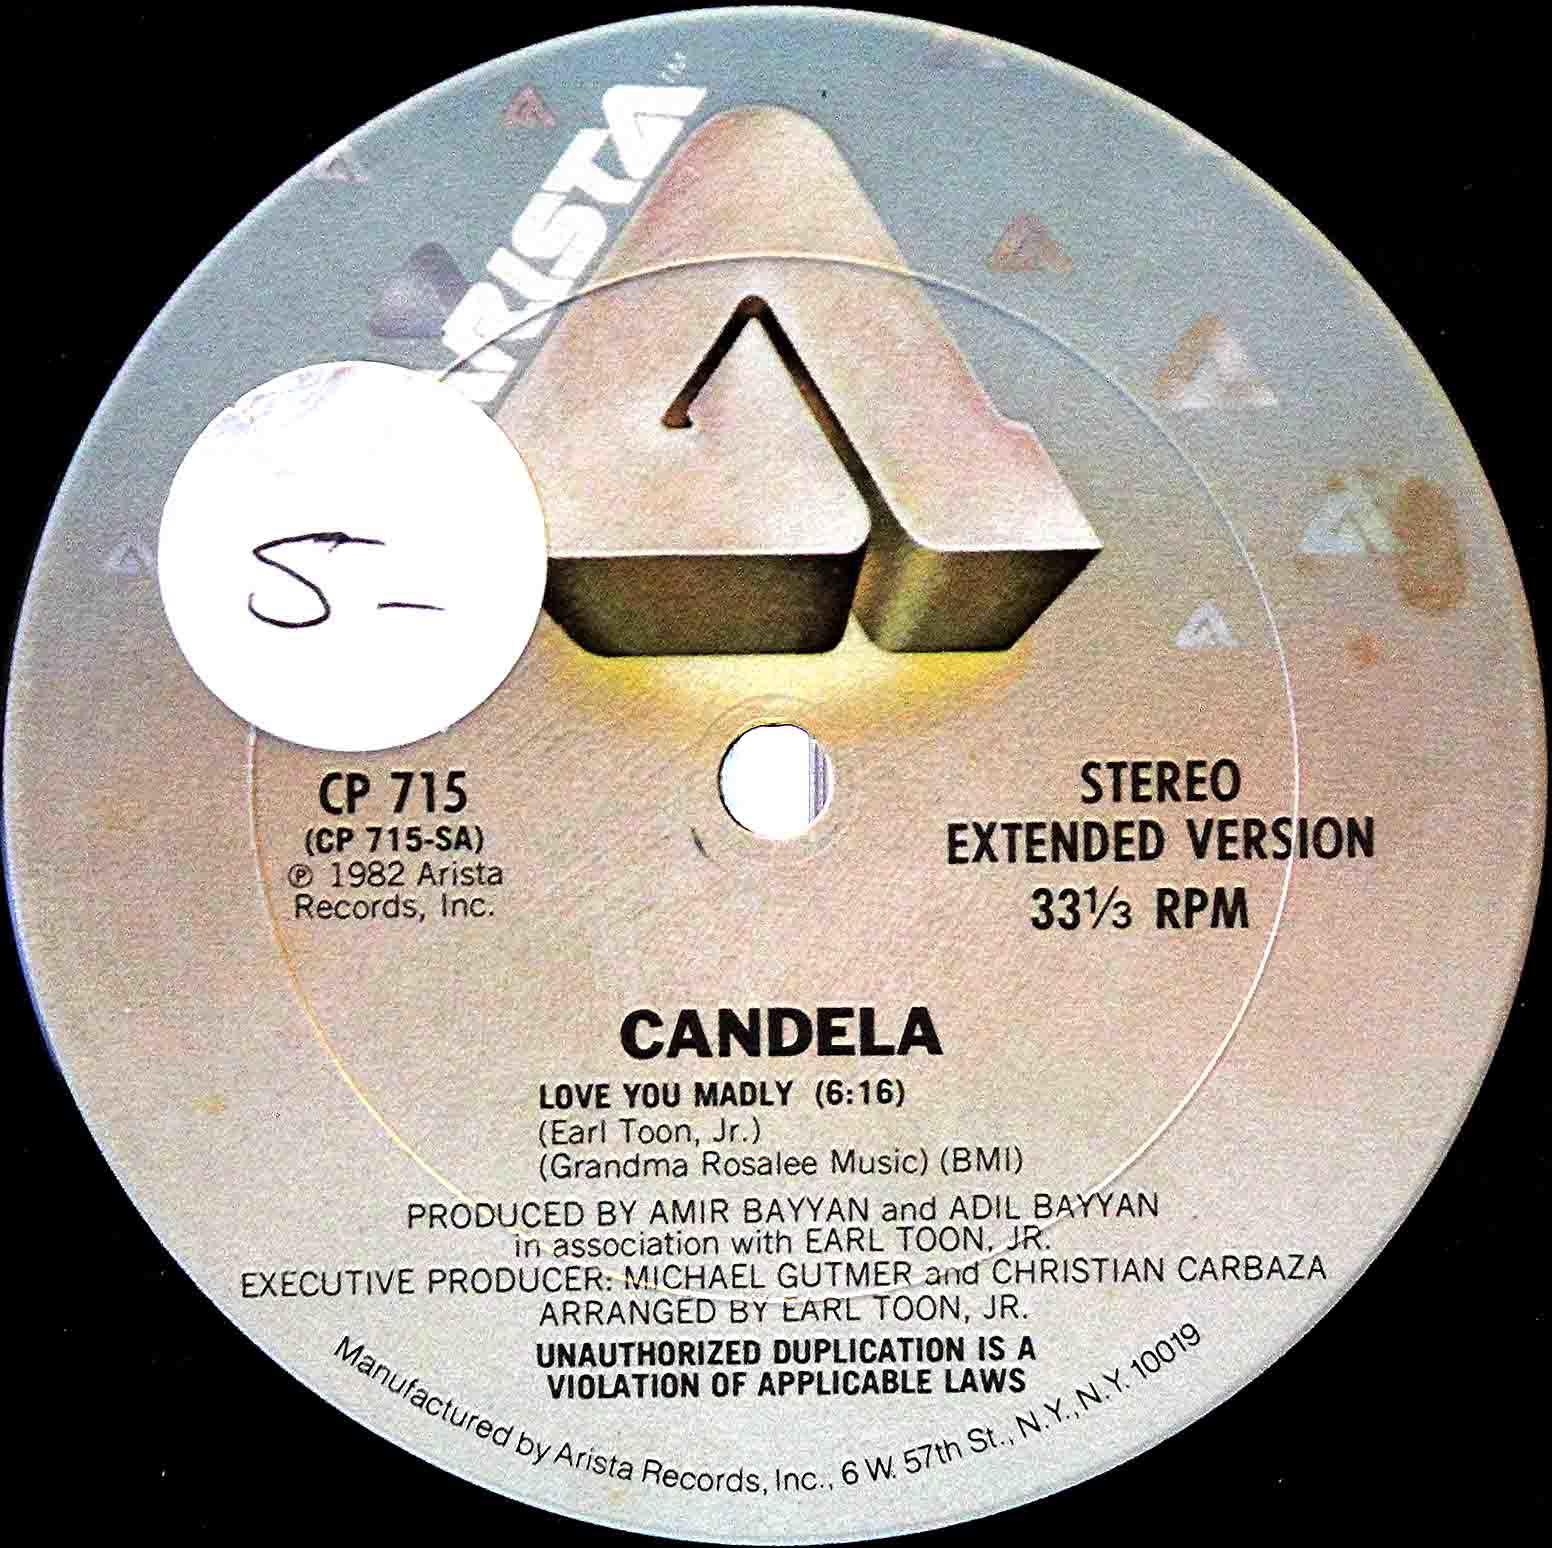 Candela - Love You Madly 02